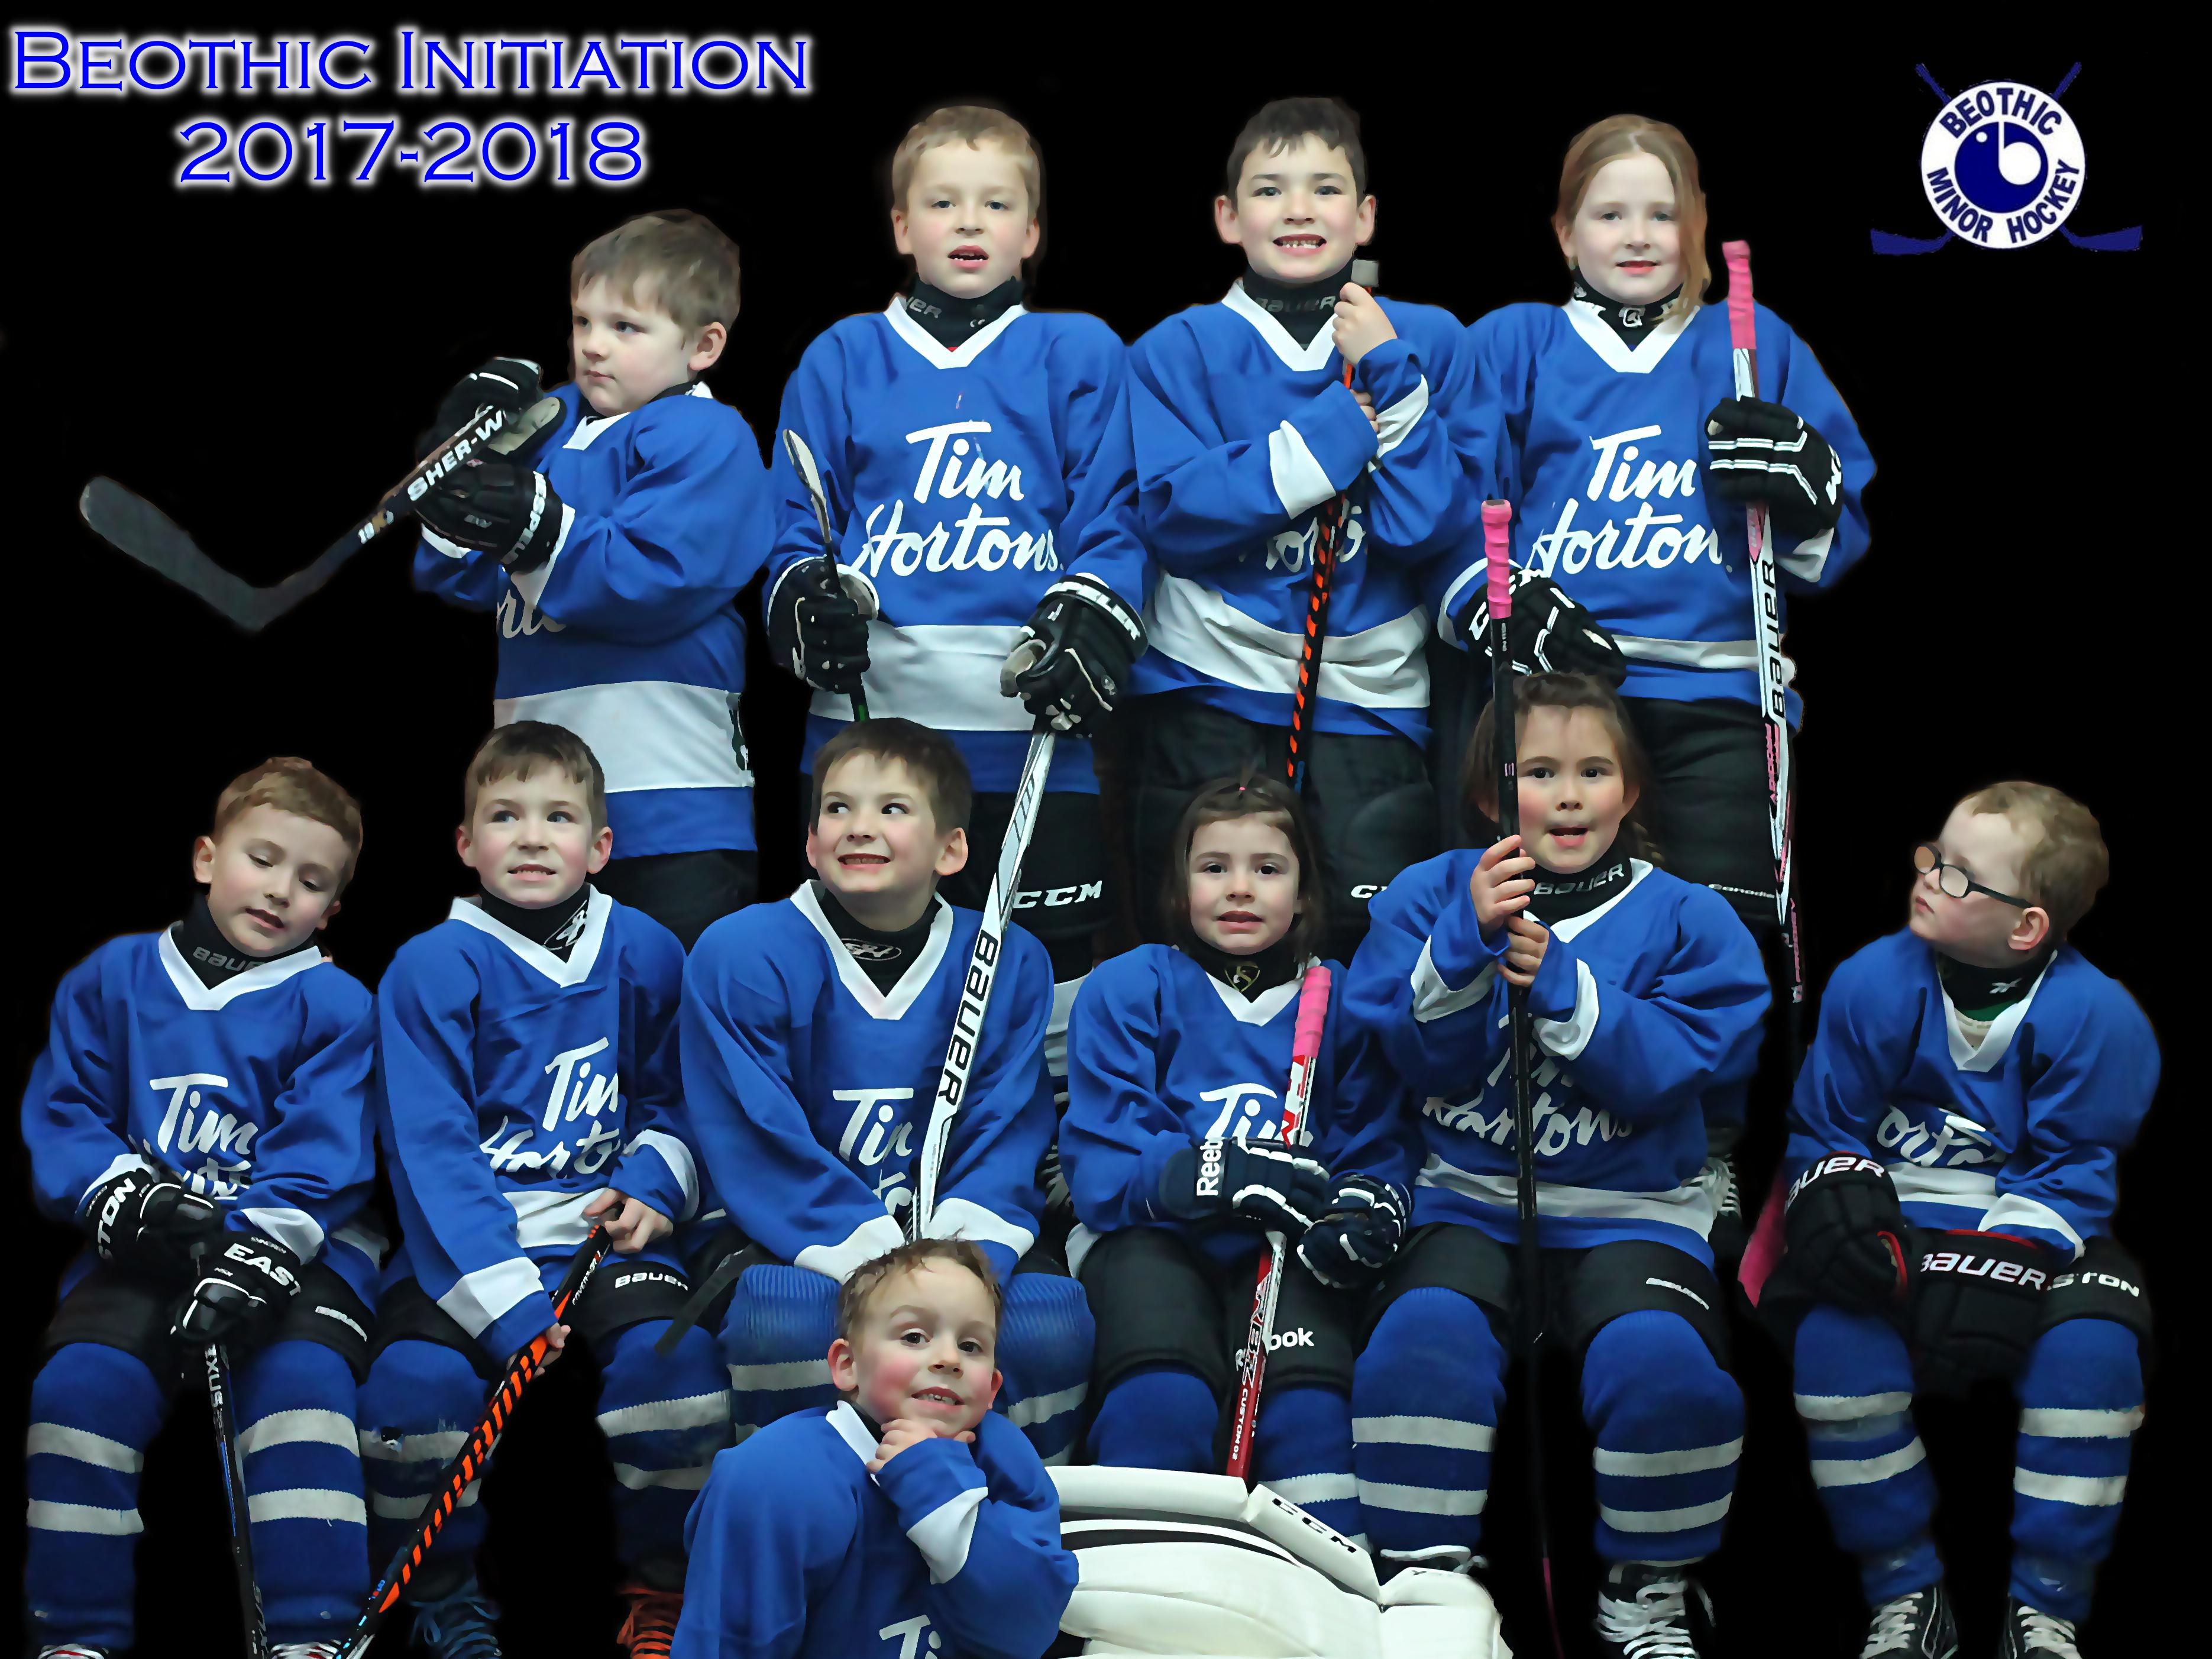 Beothic Minor Hockey